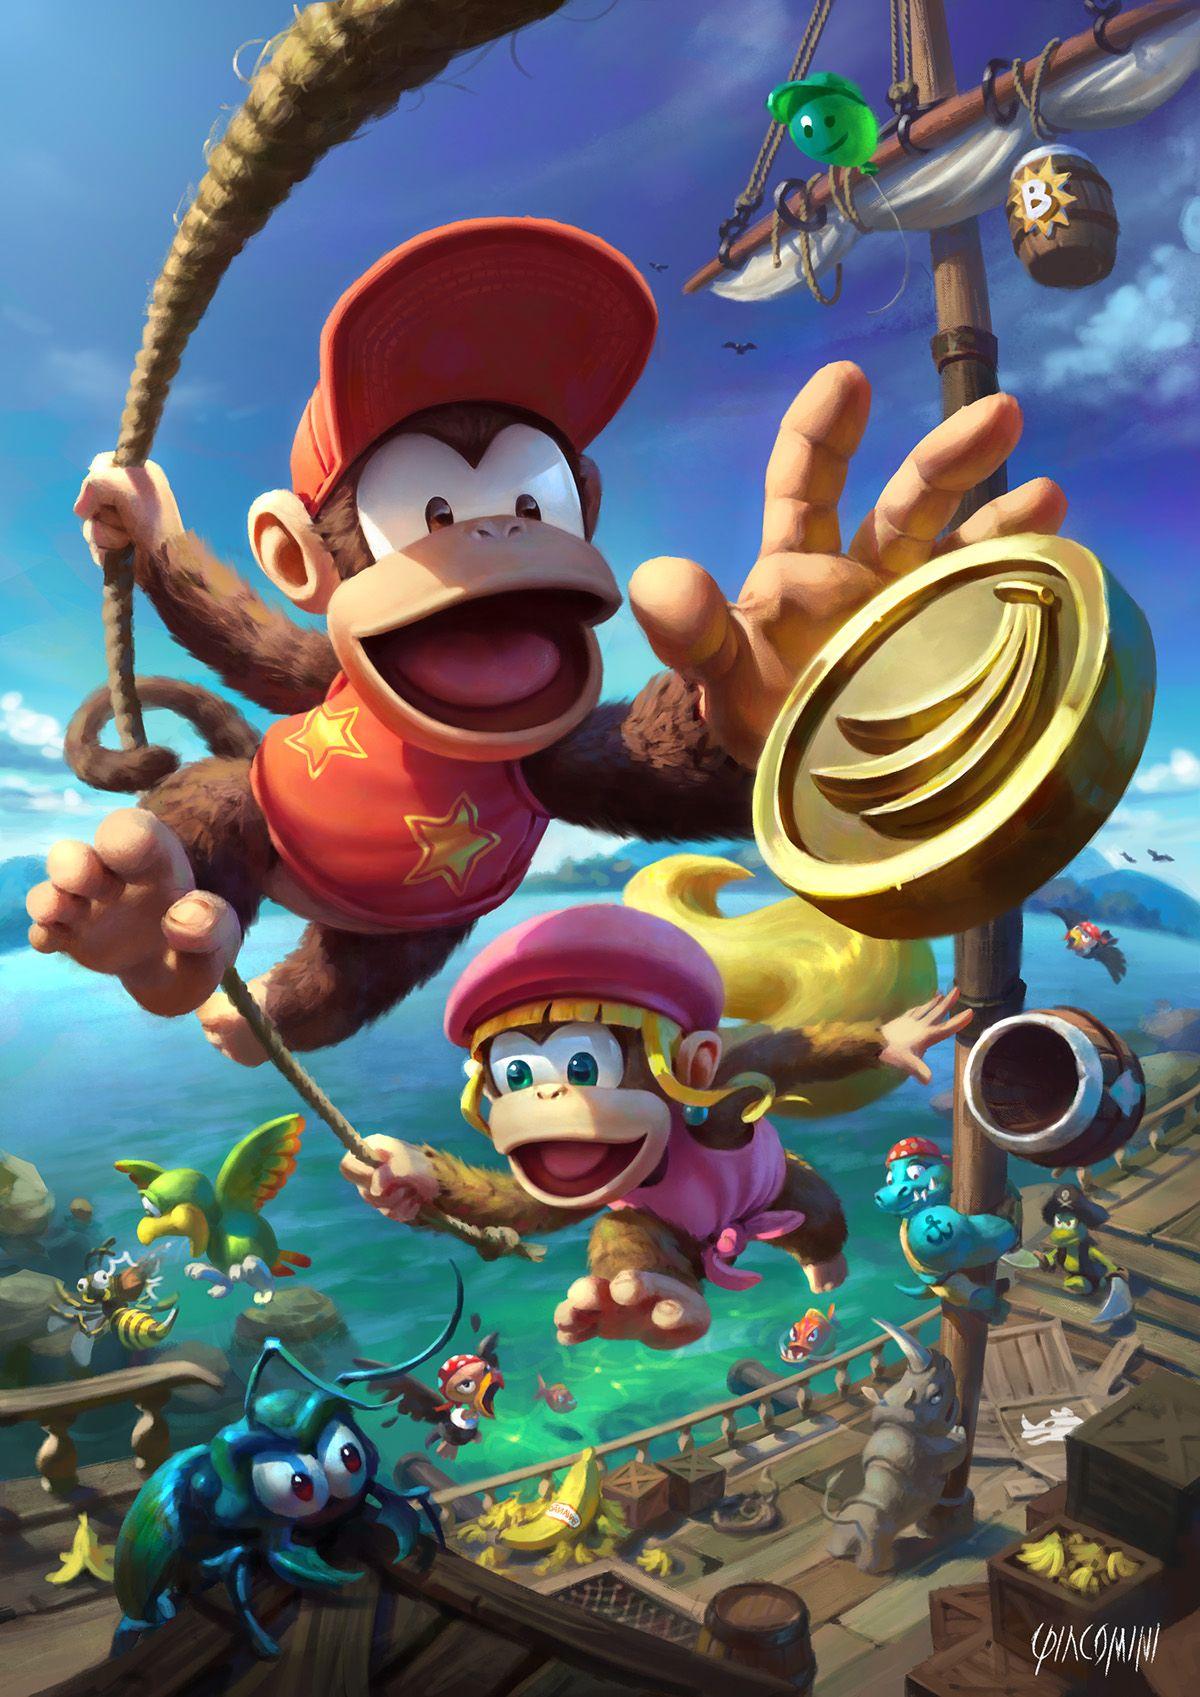 Donkey Kong Country 2 Fan Art 2017 On Behance Donkey Kong Country Donkey Kong Mario Art